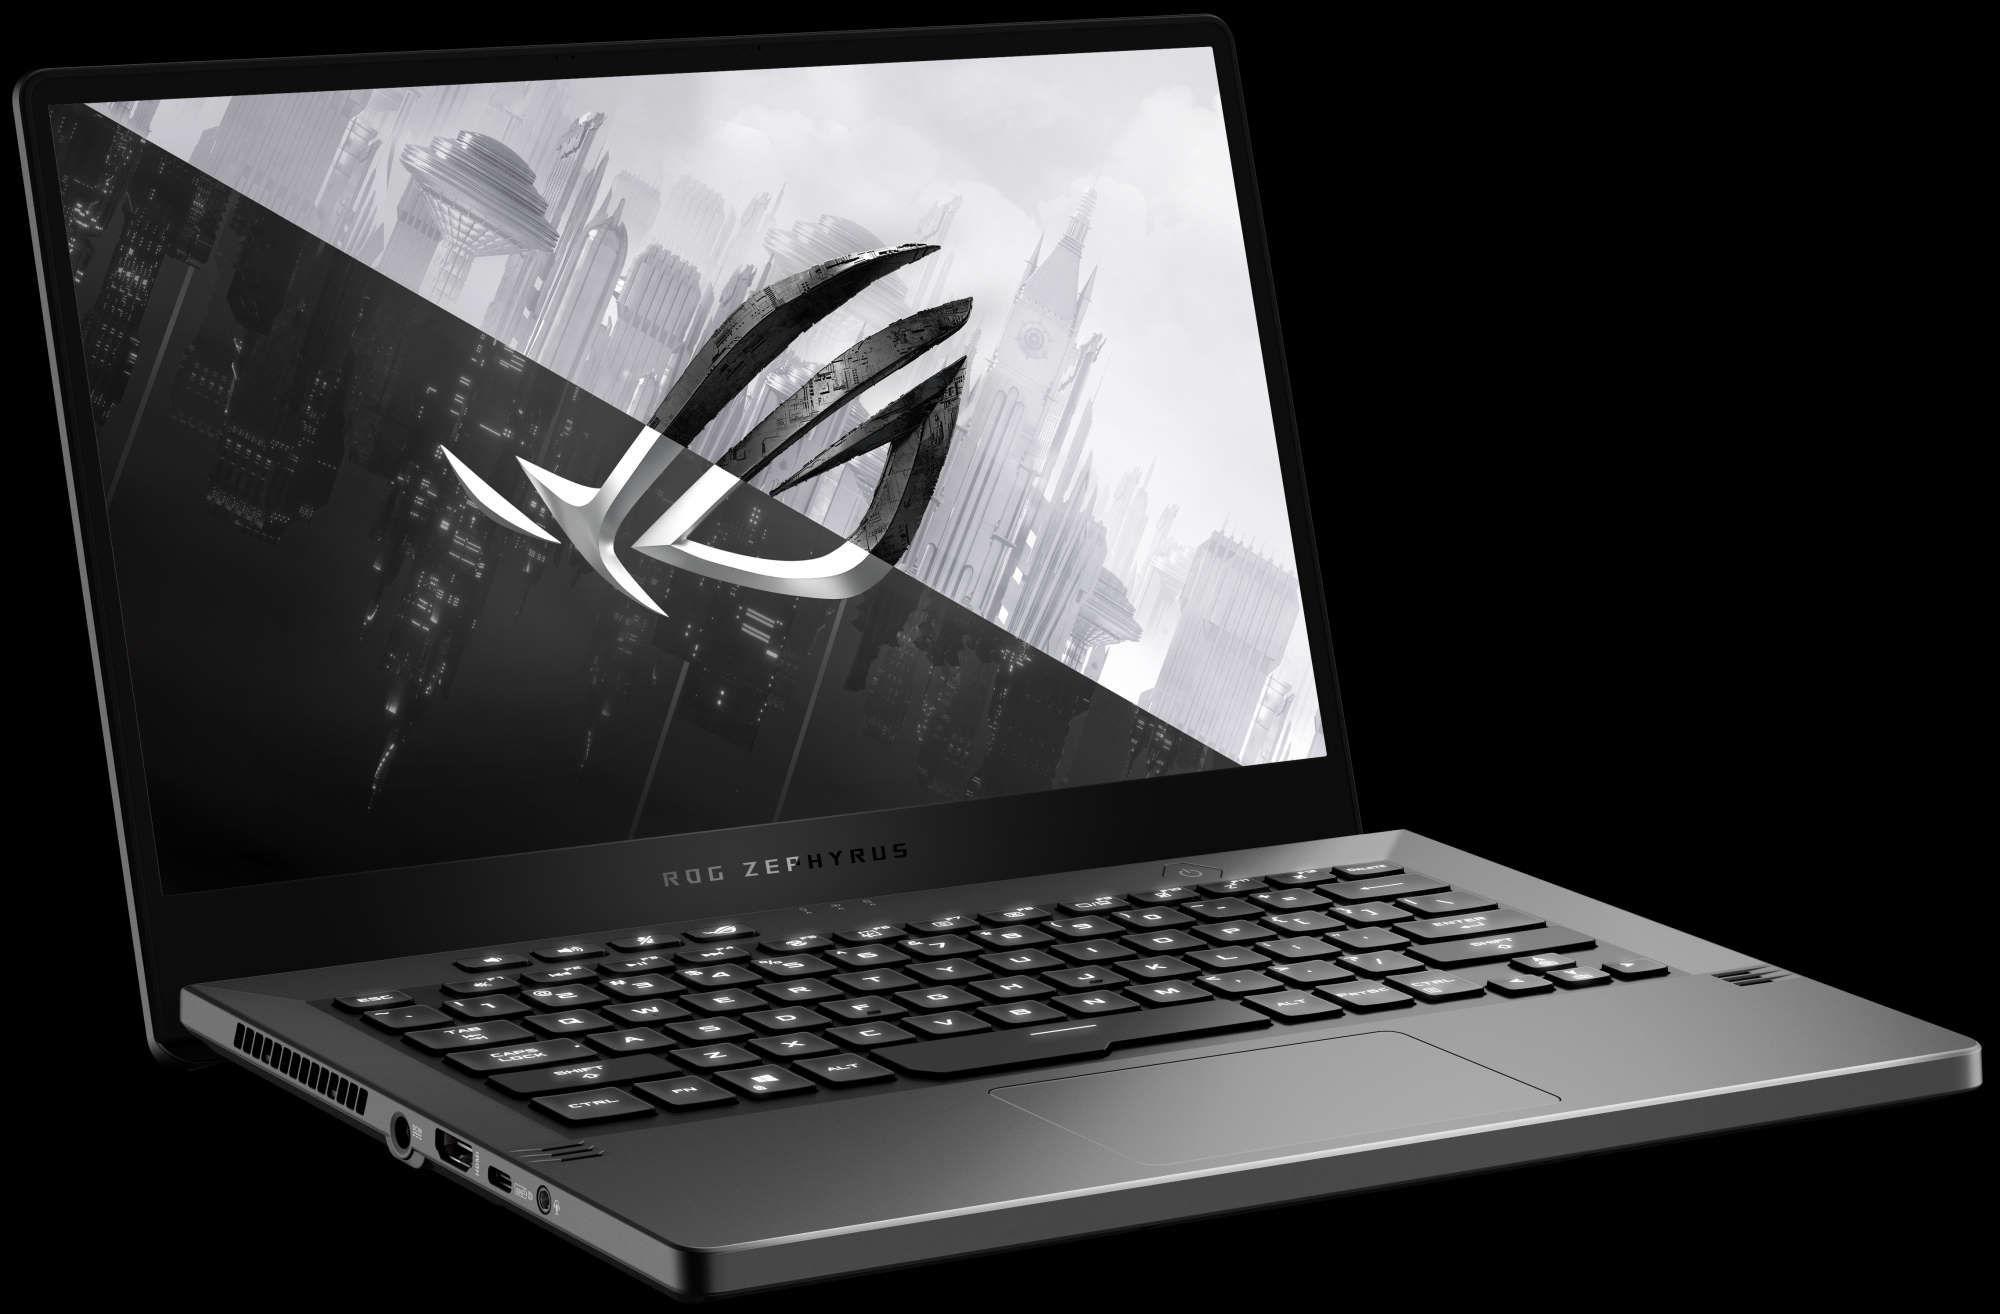 Asus ROG Zephyrus G14: best gaming laptop